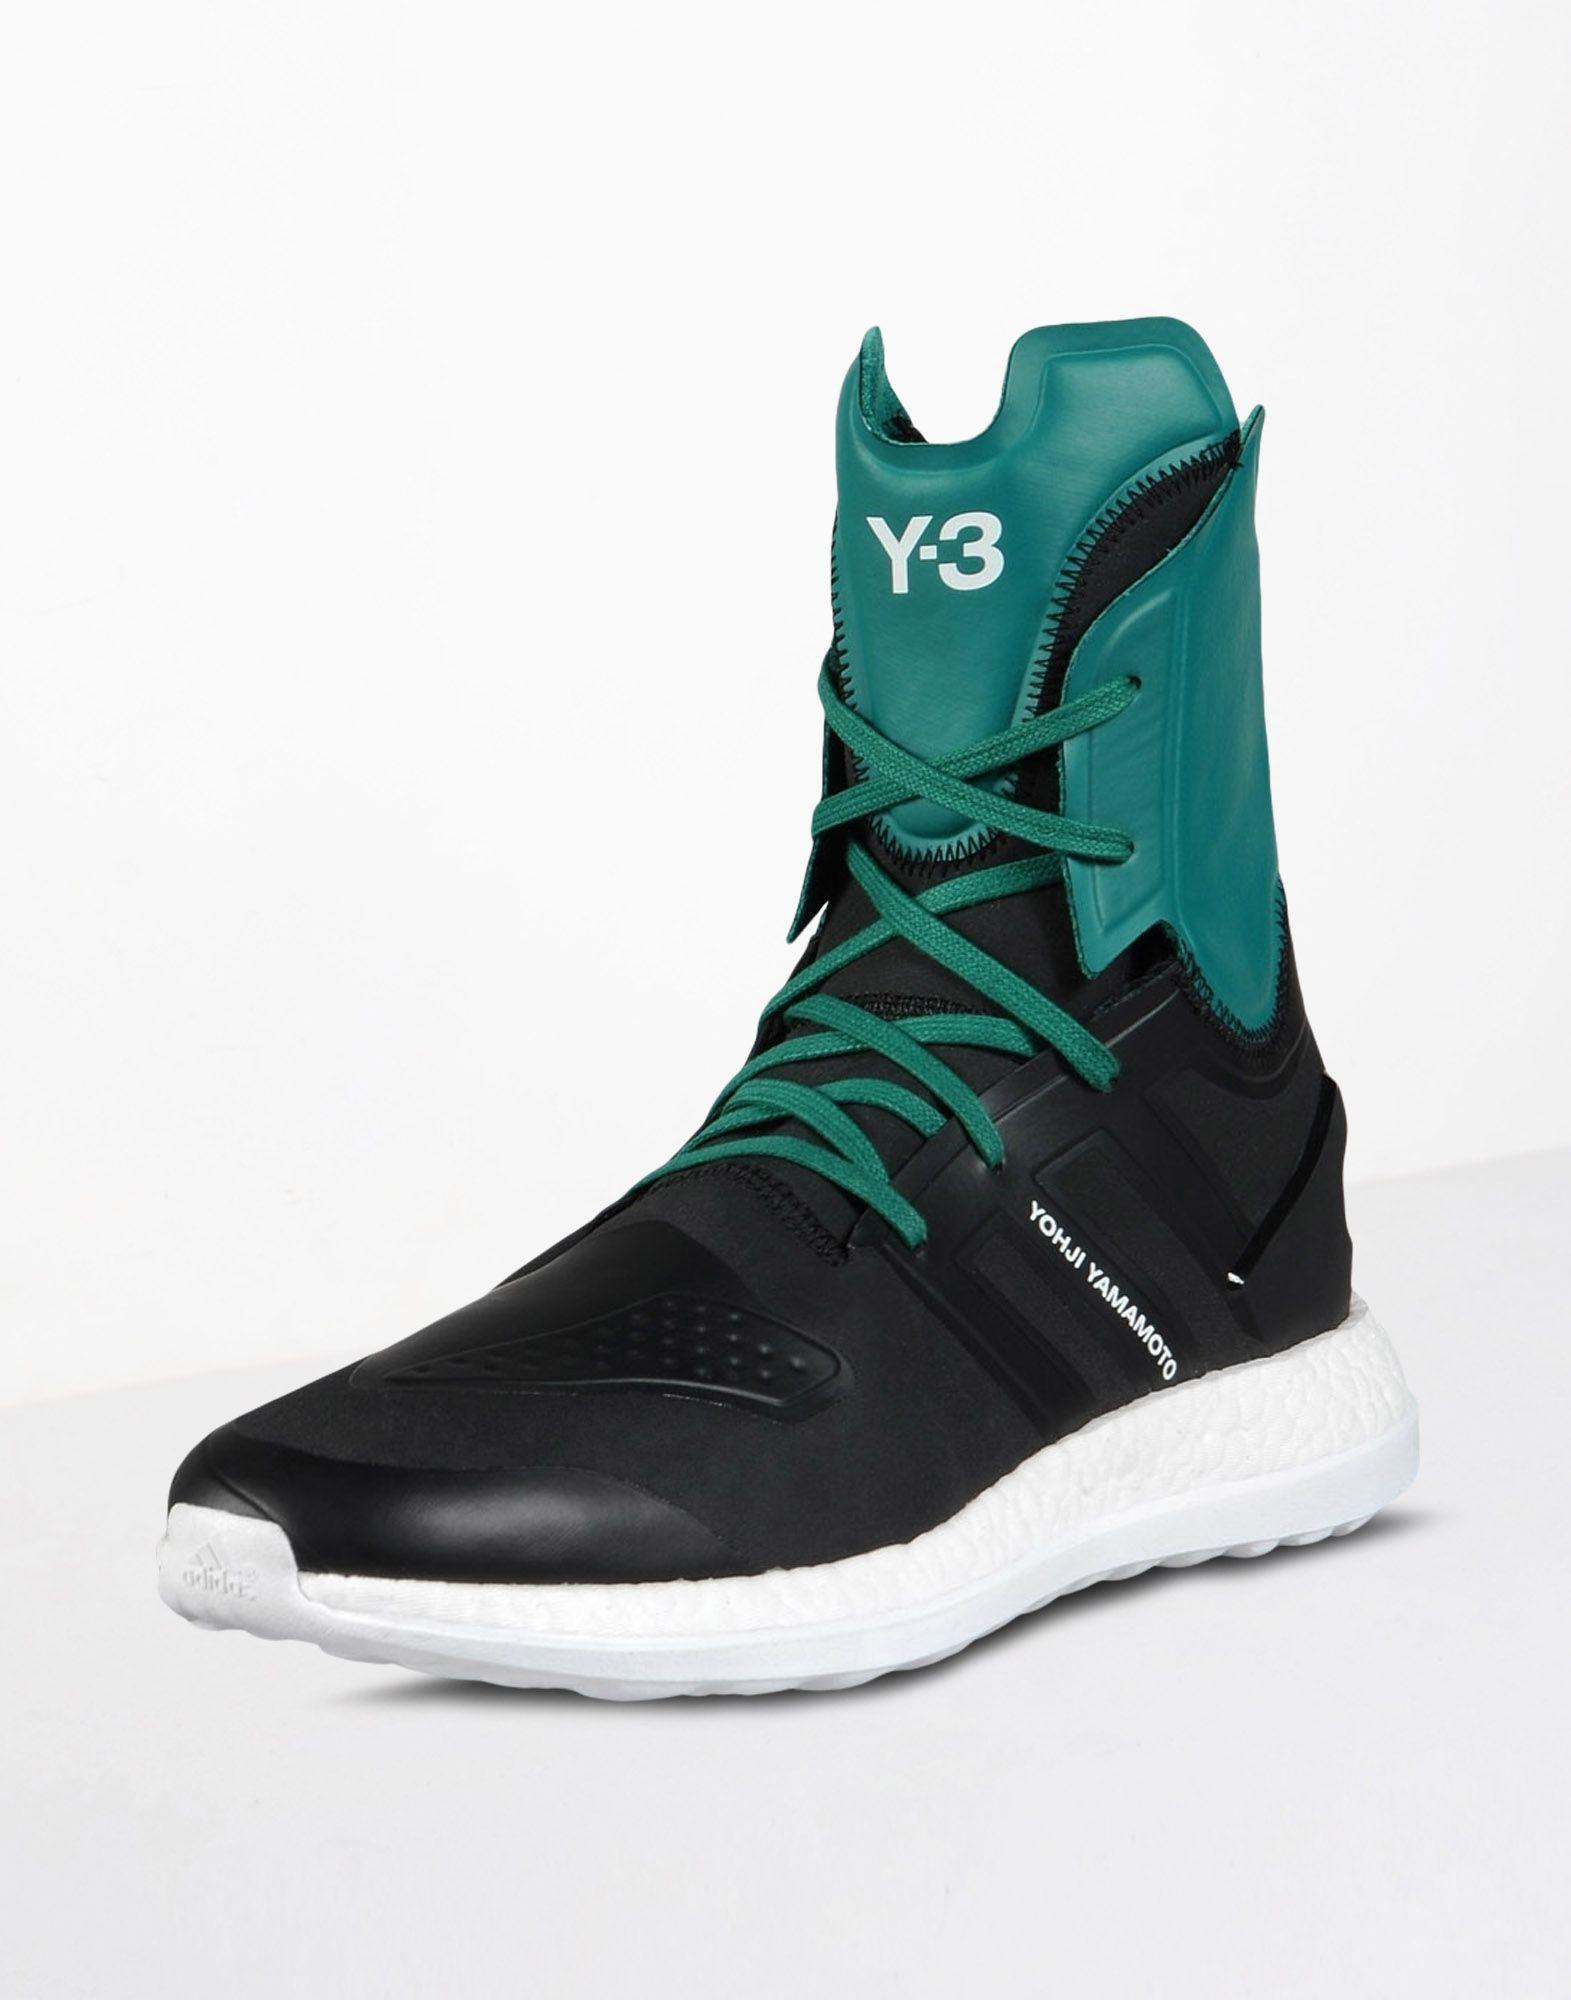 54276ecab4cee Y-3 PUREBOOST ZG HIGH Shoes man Y-3 adidas